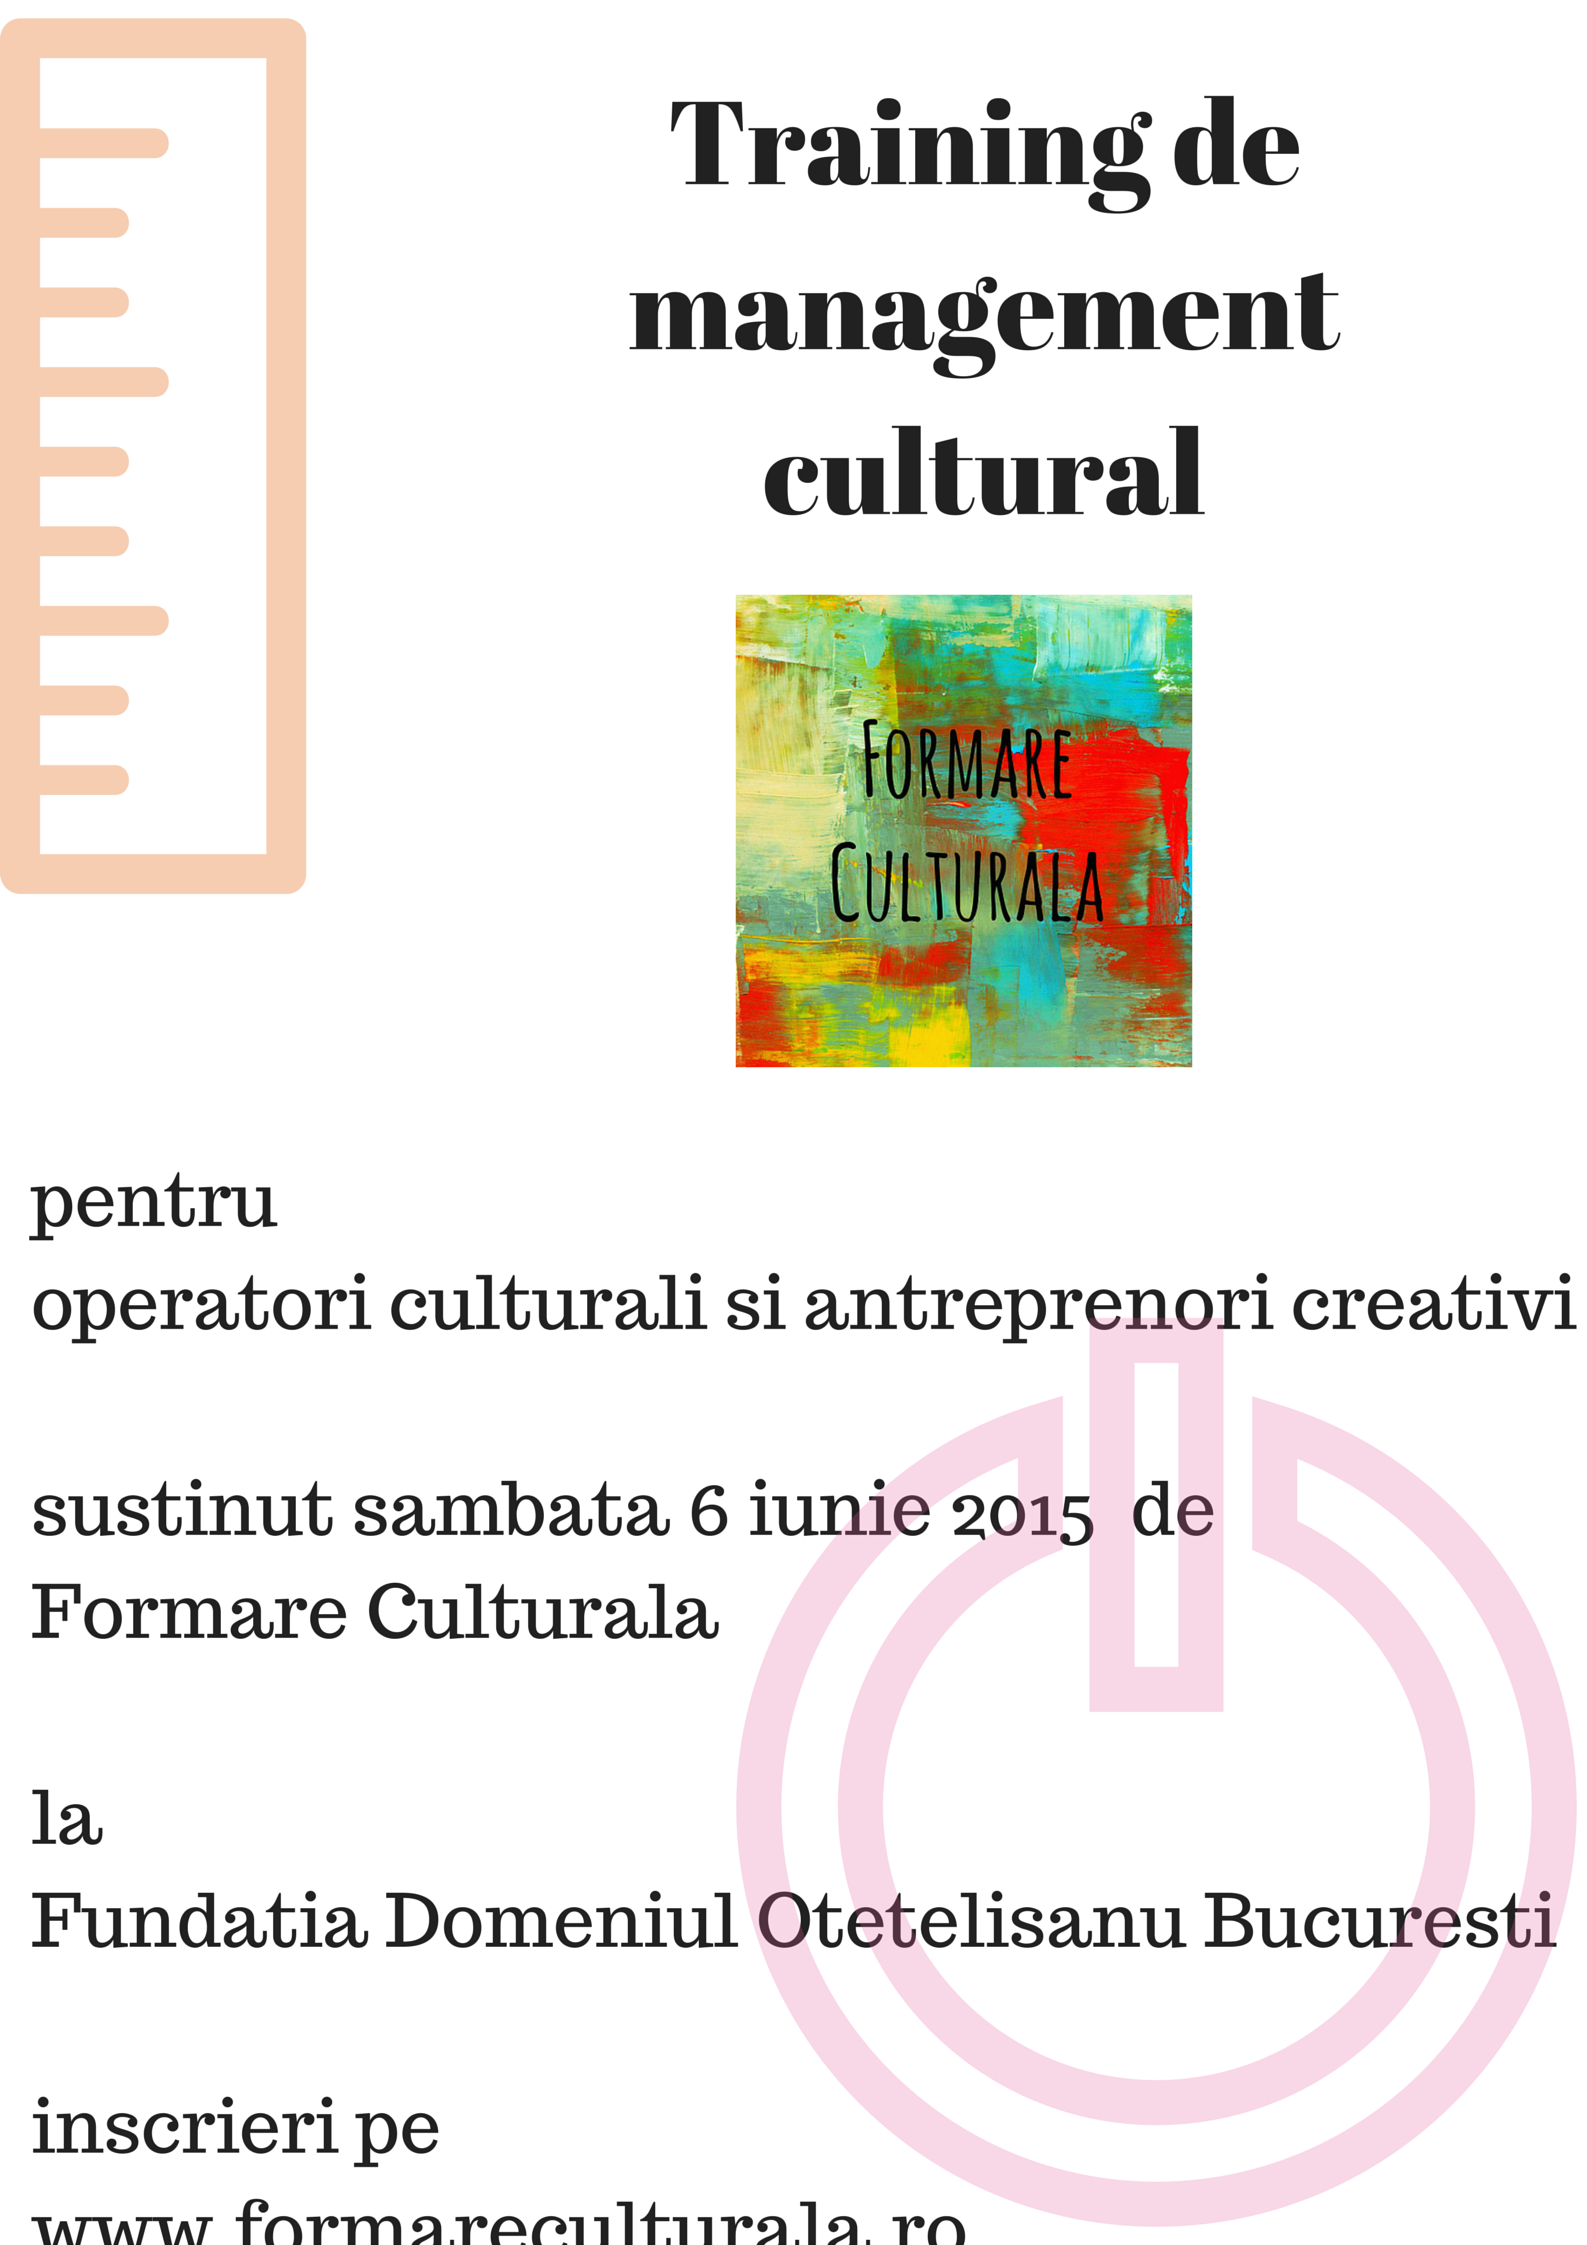 Training de managment cultural Formare